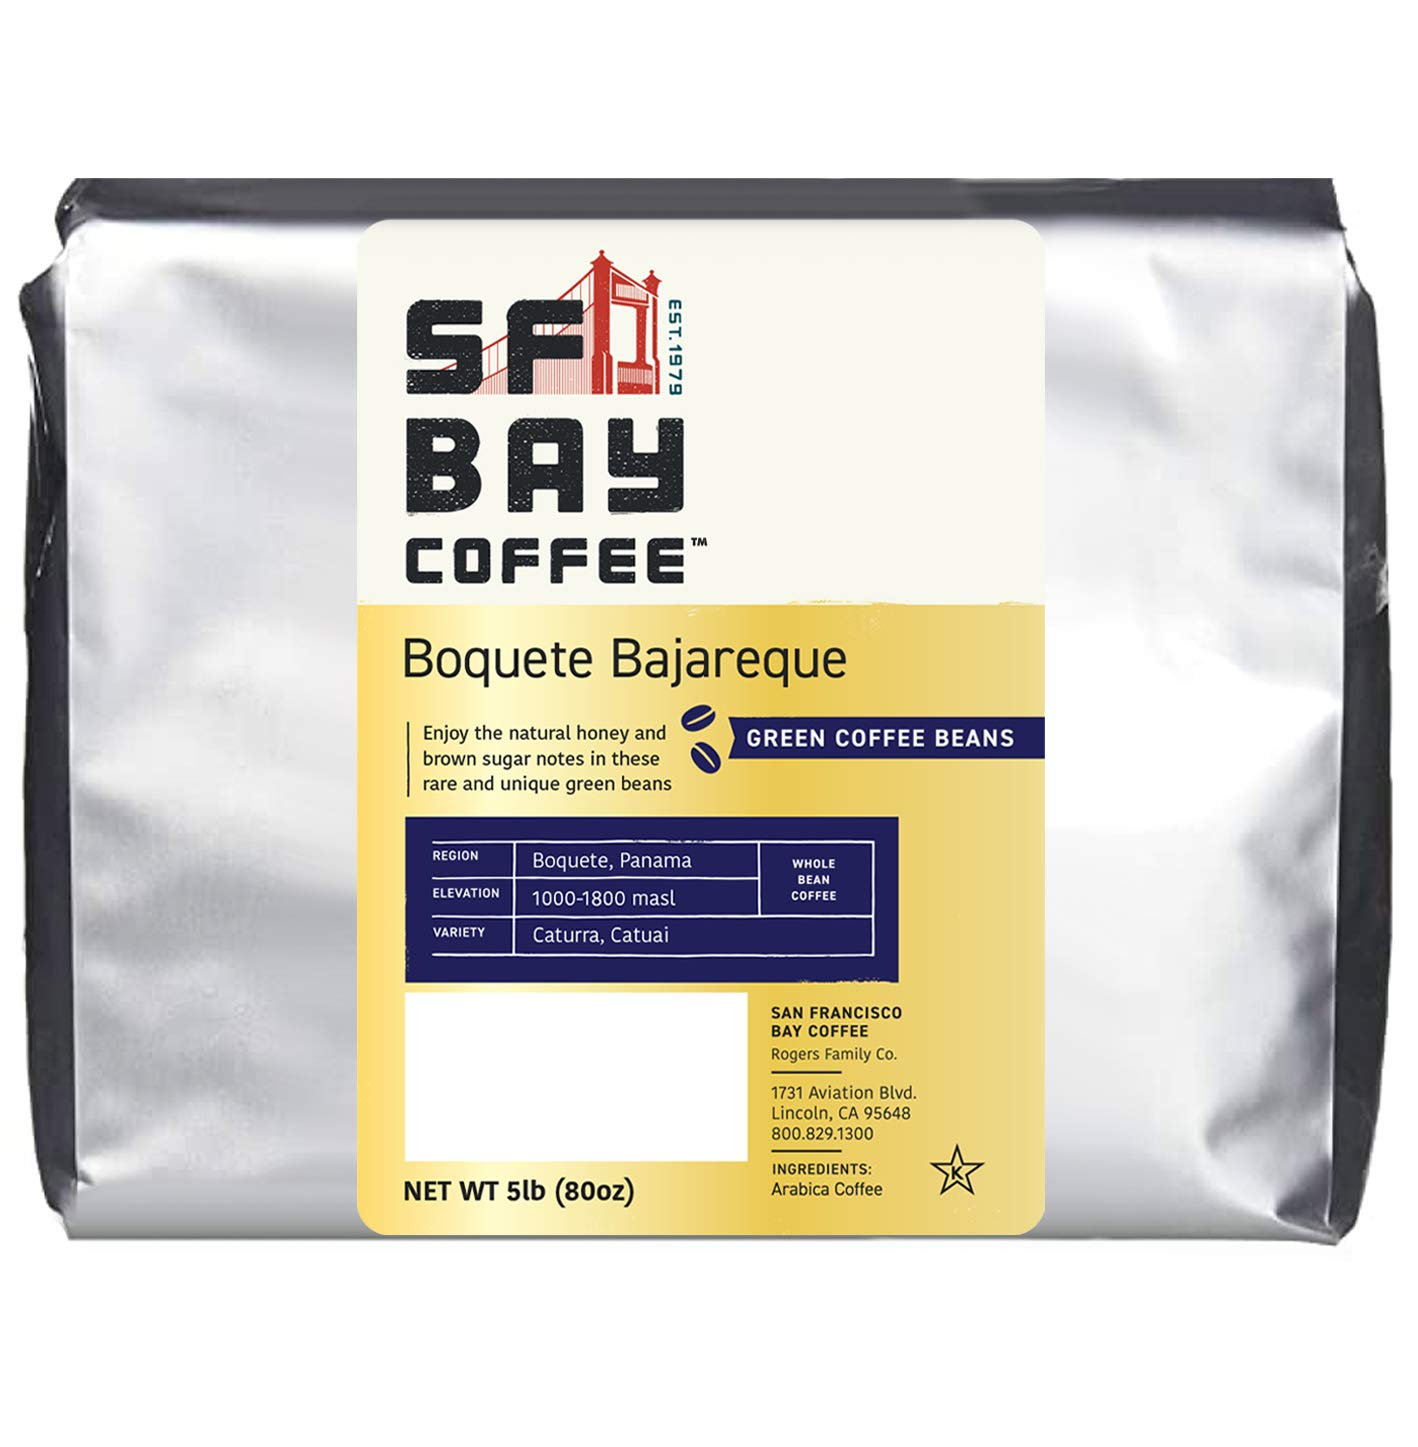 San Francisco Bay Unroasted Green Coffee Beans, Panama Boquete Bajareque, Specialty Grade Coffee, Direct Trade, 5 Lb